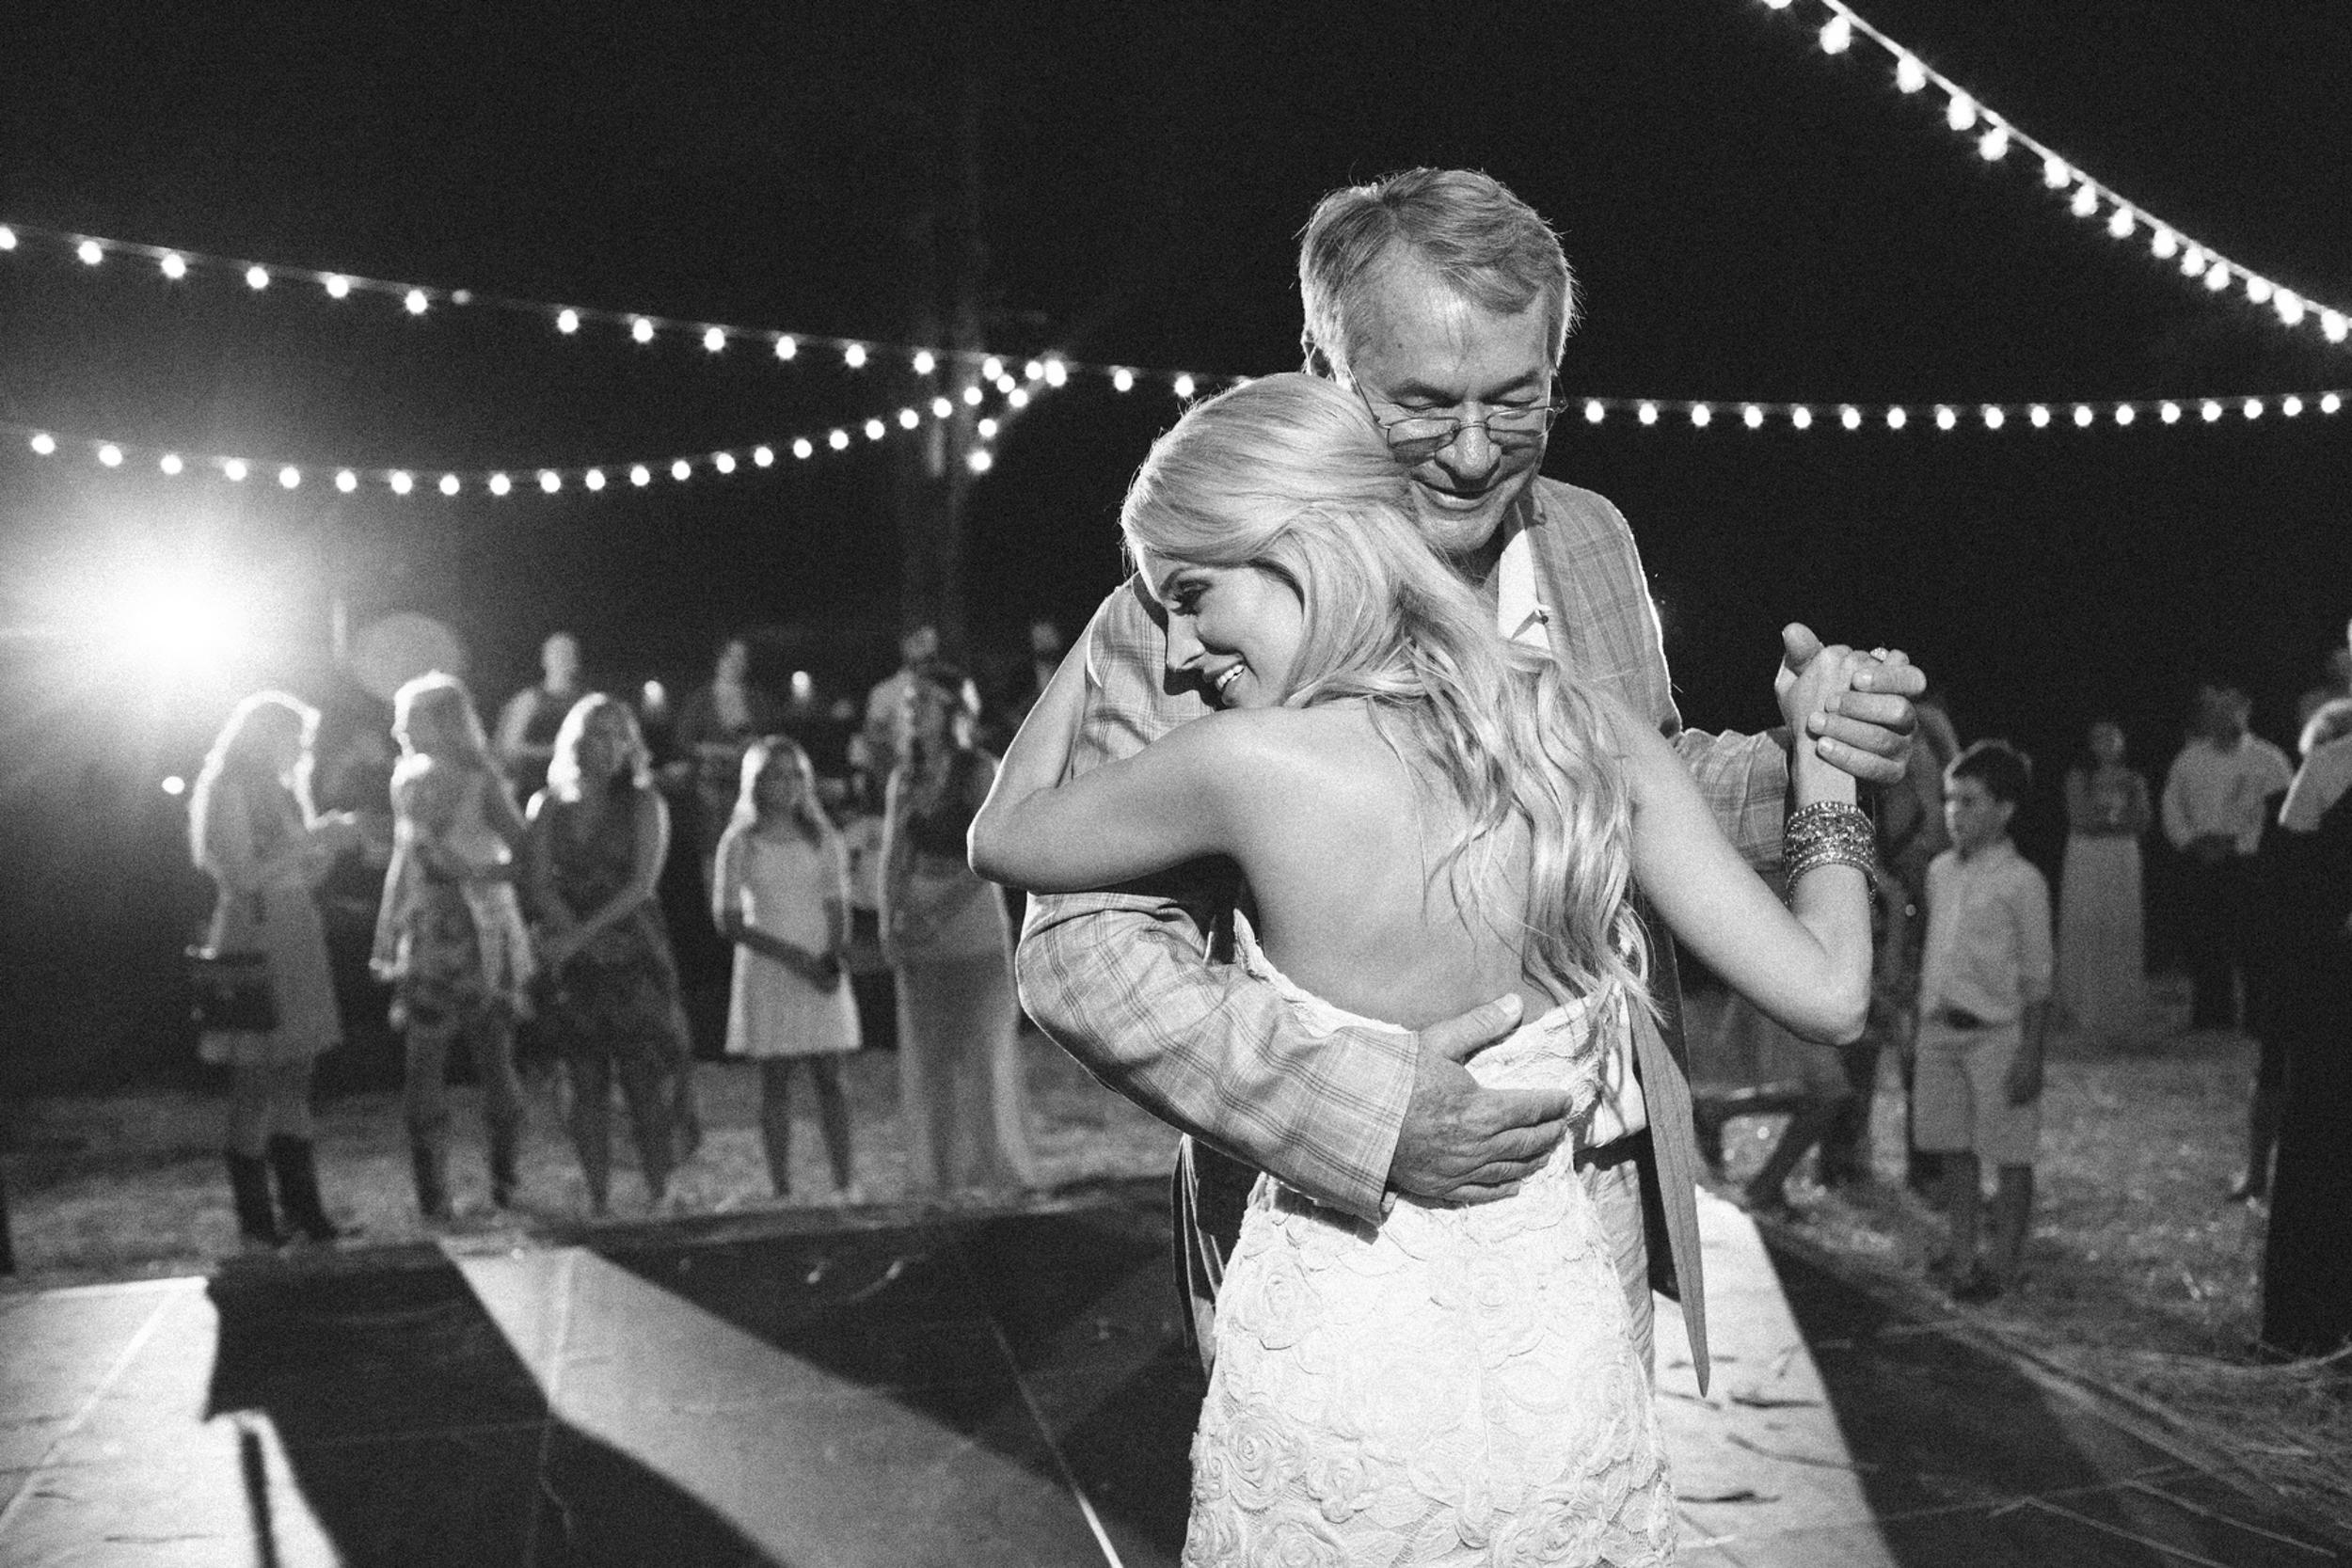 south_carolina_farm_wedding_rustic_chic_surprise_secret_luxe_wedding_bachelorette_emily_maynard_real_weddings-52.jpg